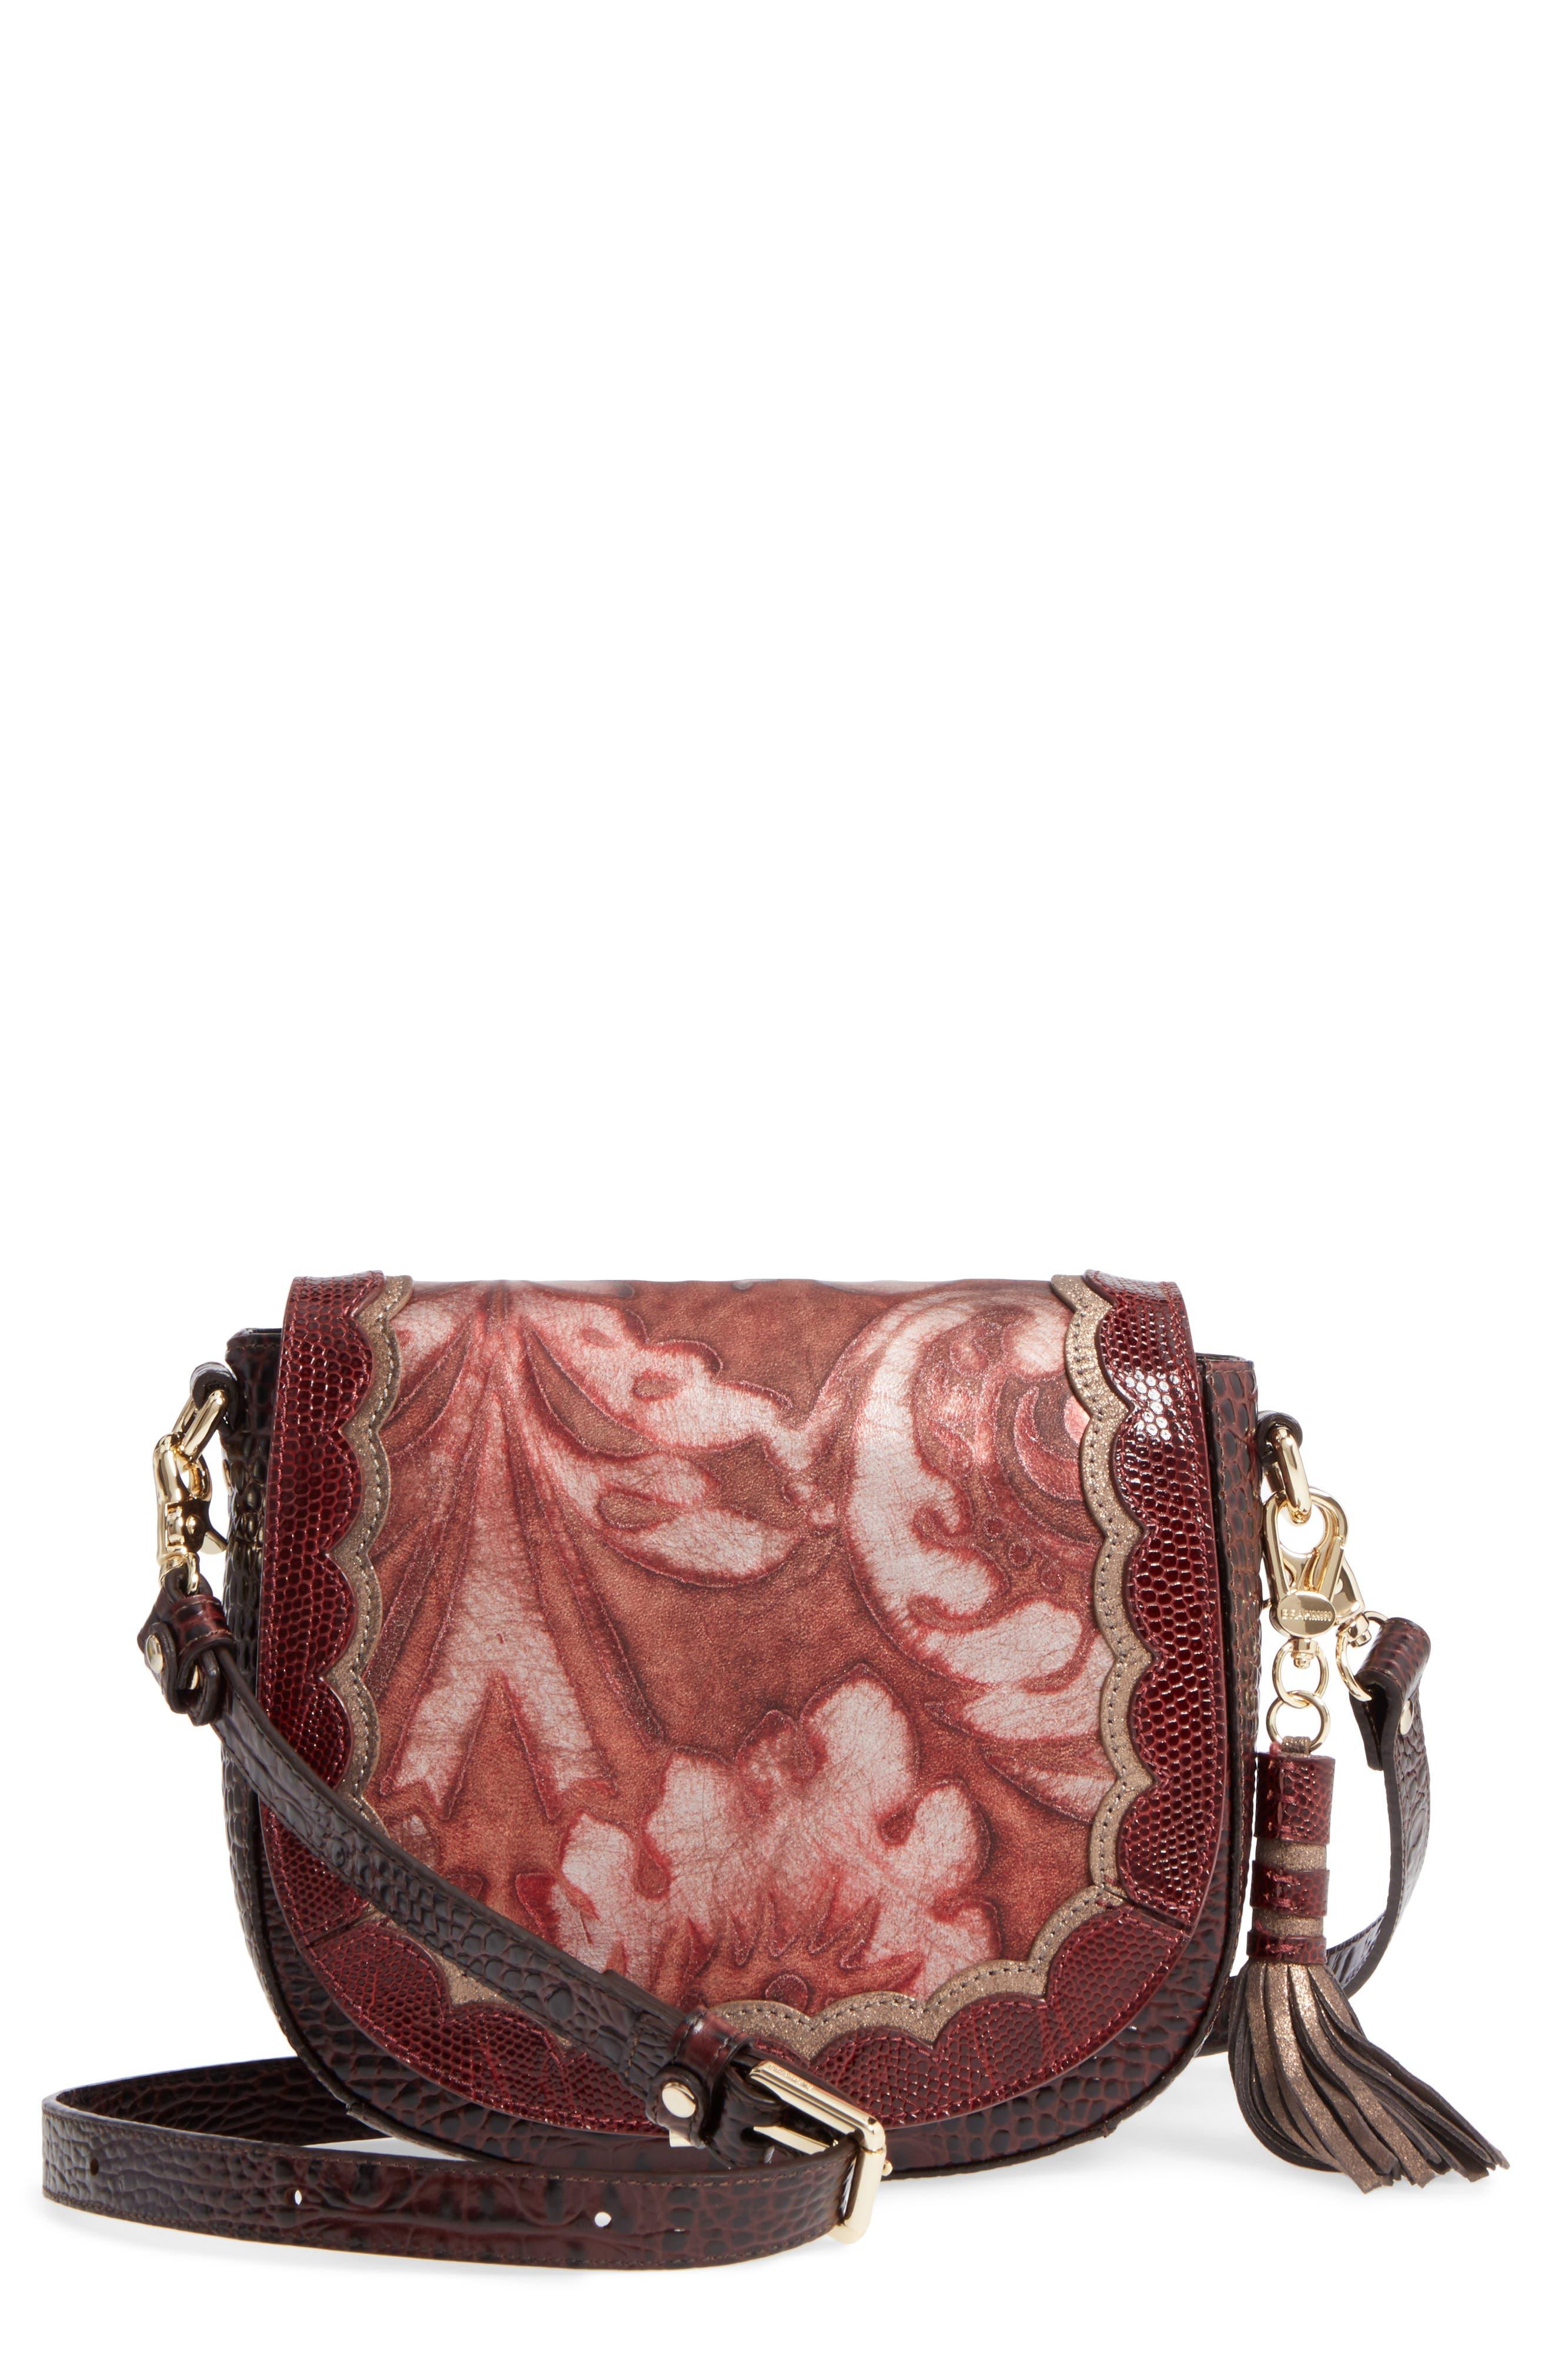 Brahmin Verona Mini Sonny Leather Crossbody Bag